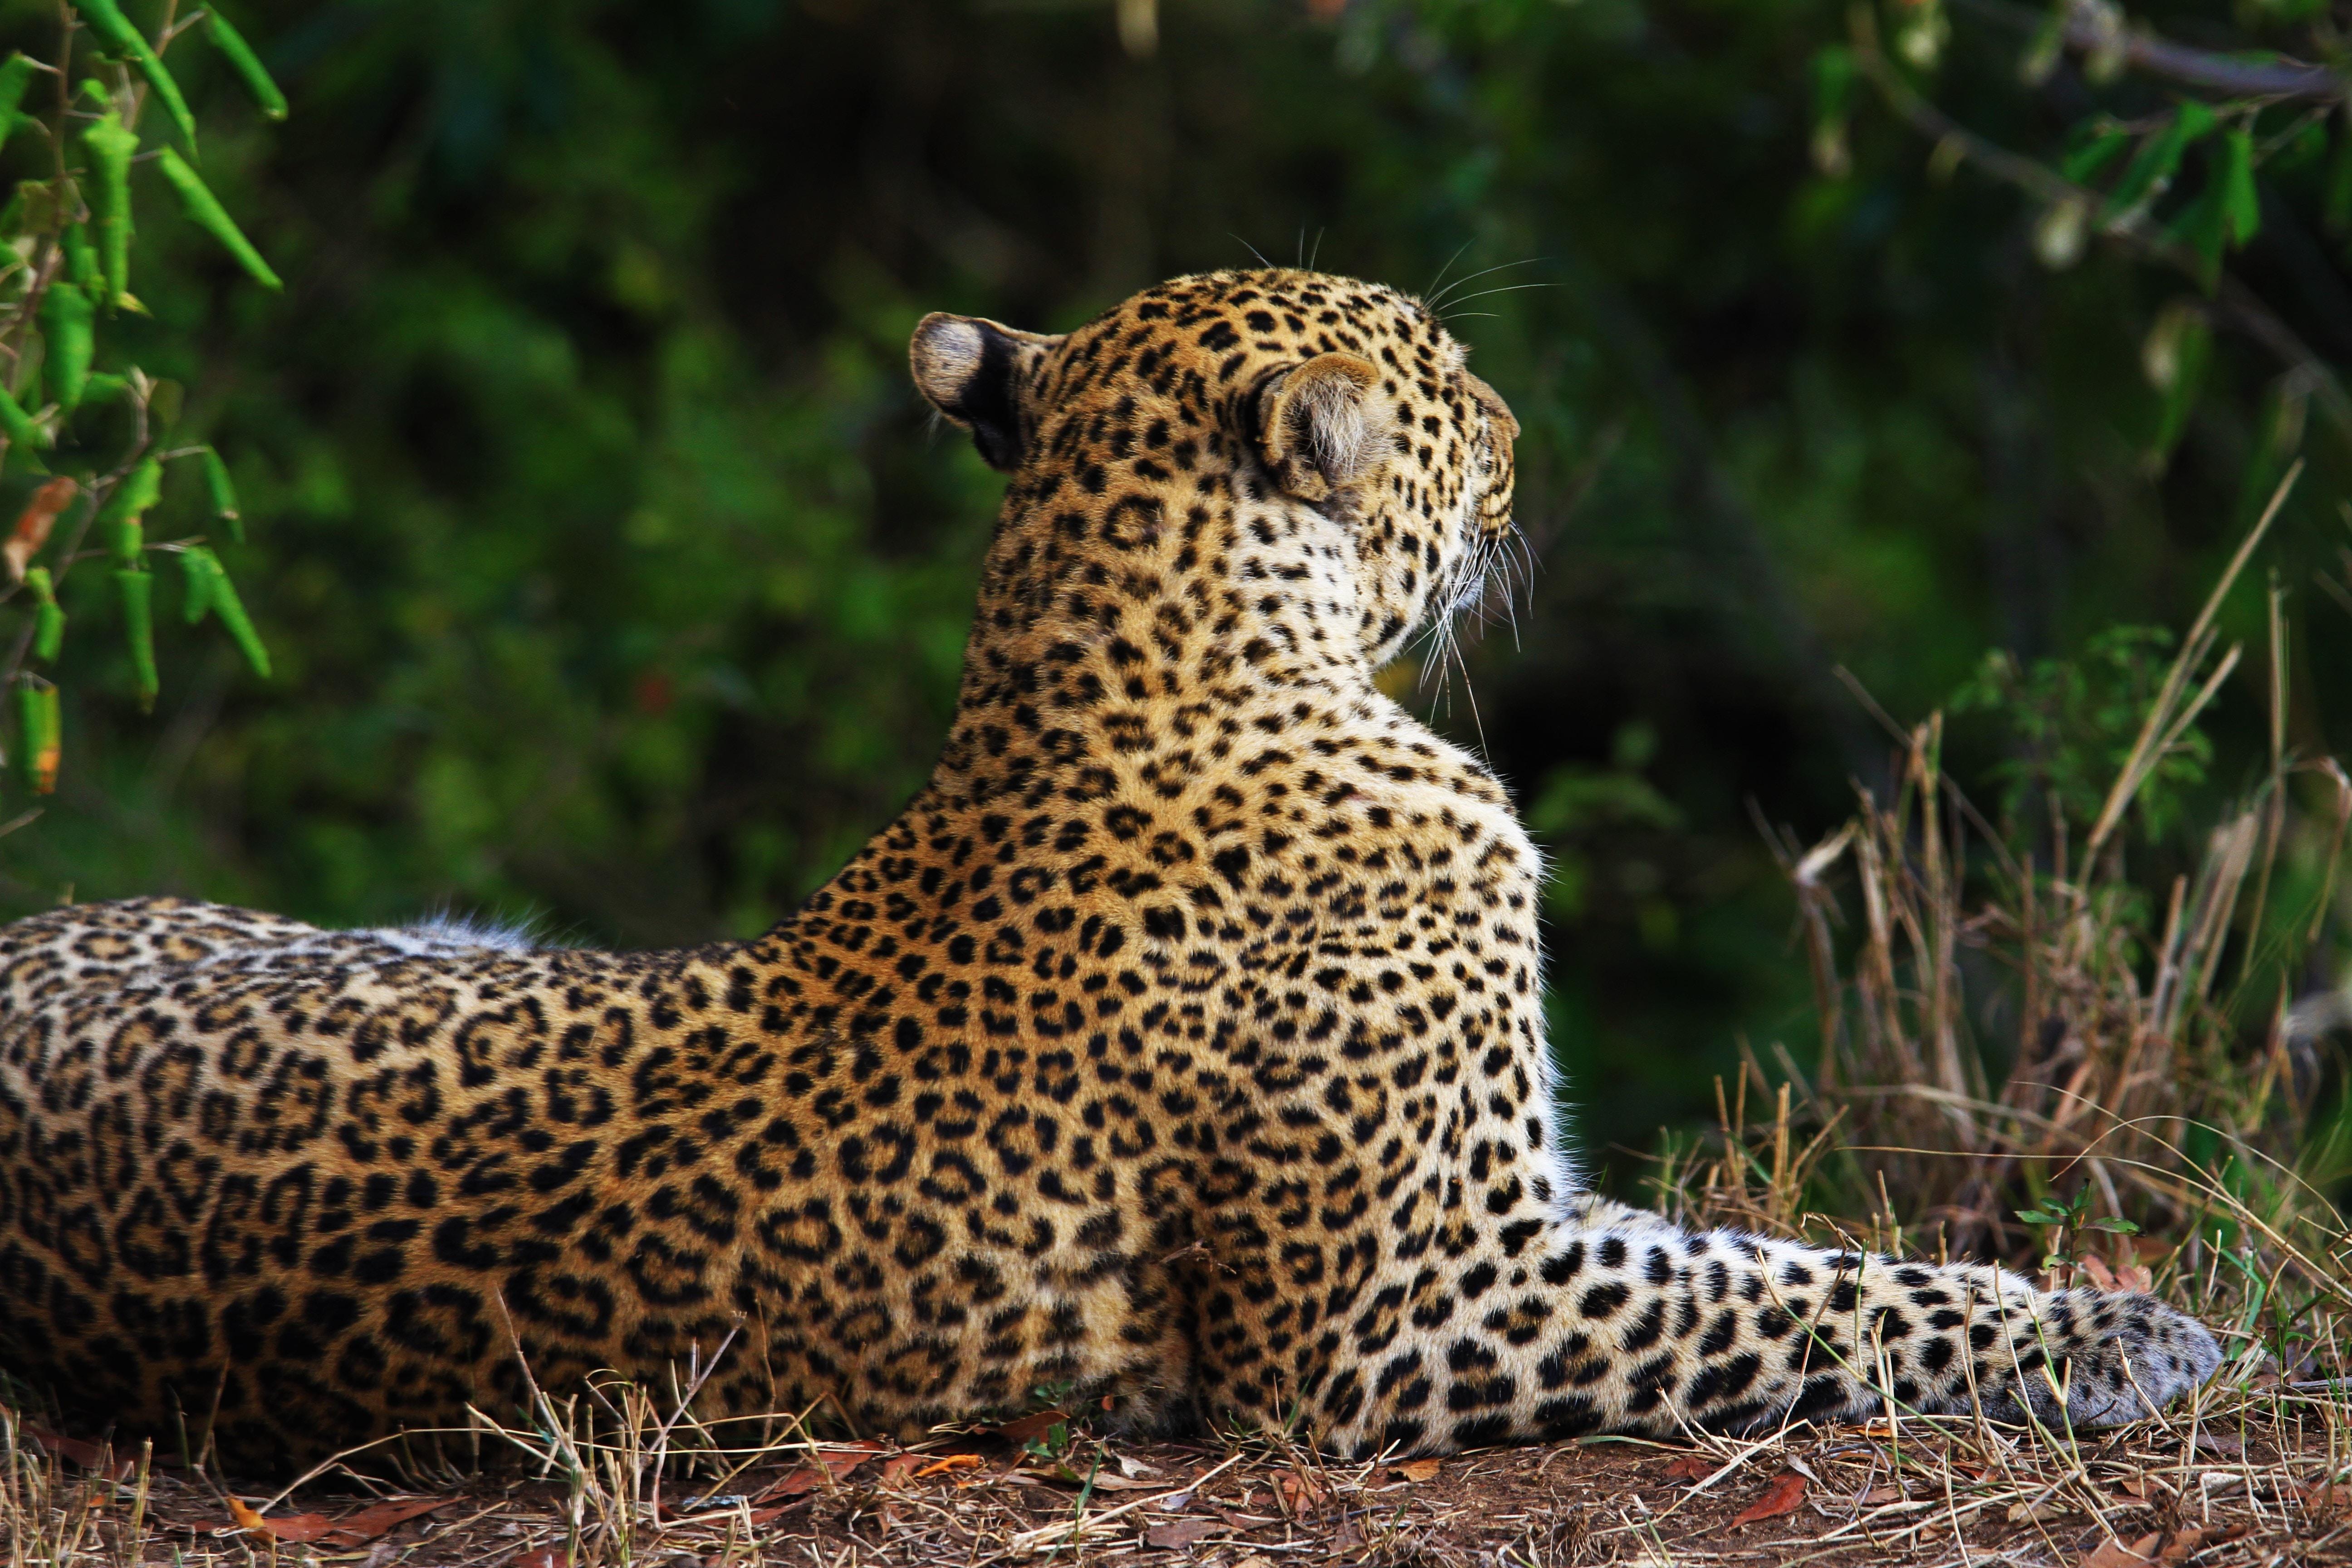 photo of leopard sitting near grass